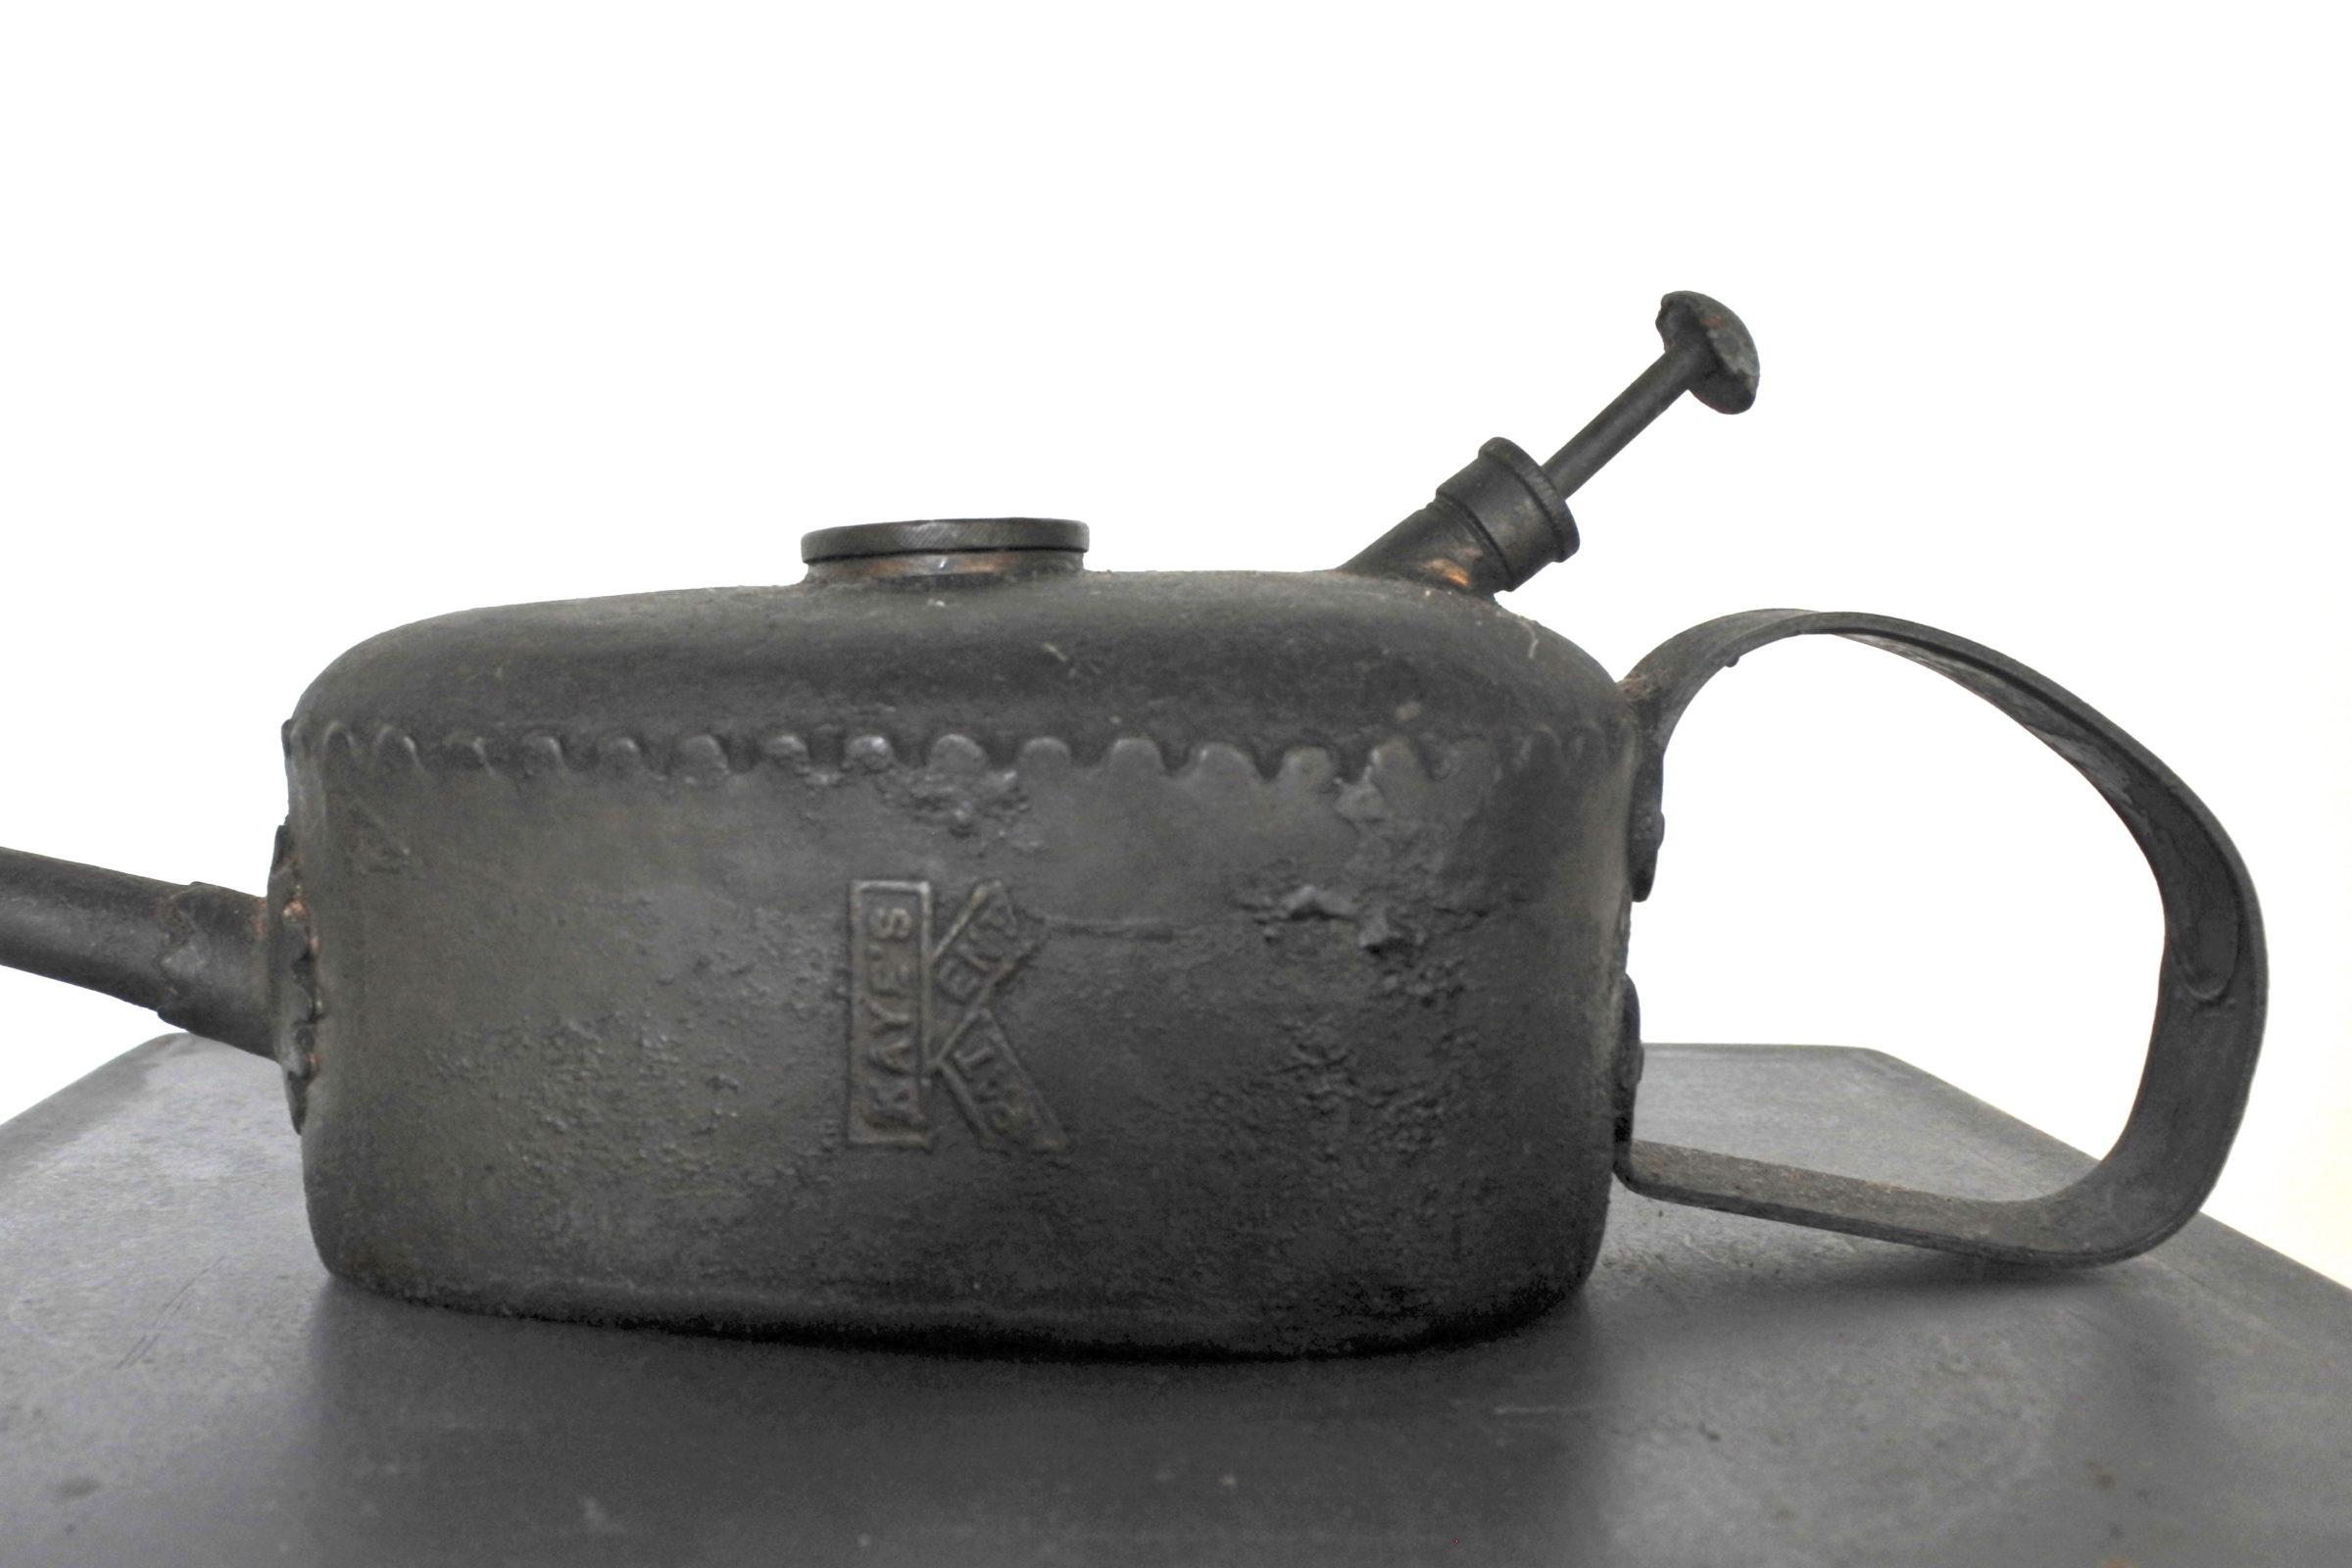 Oliatore in metallo - Kaye's patent n° 228439 - 3